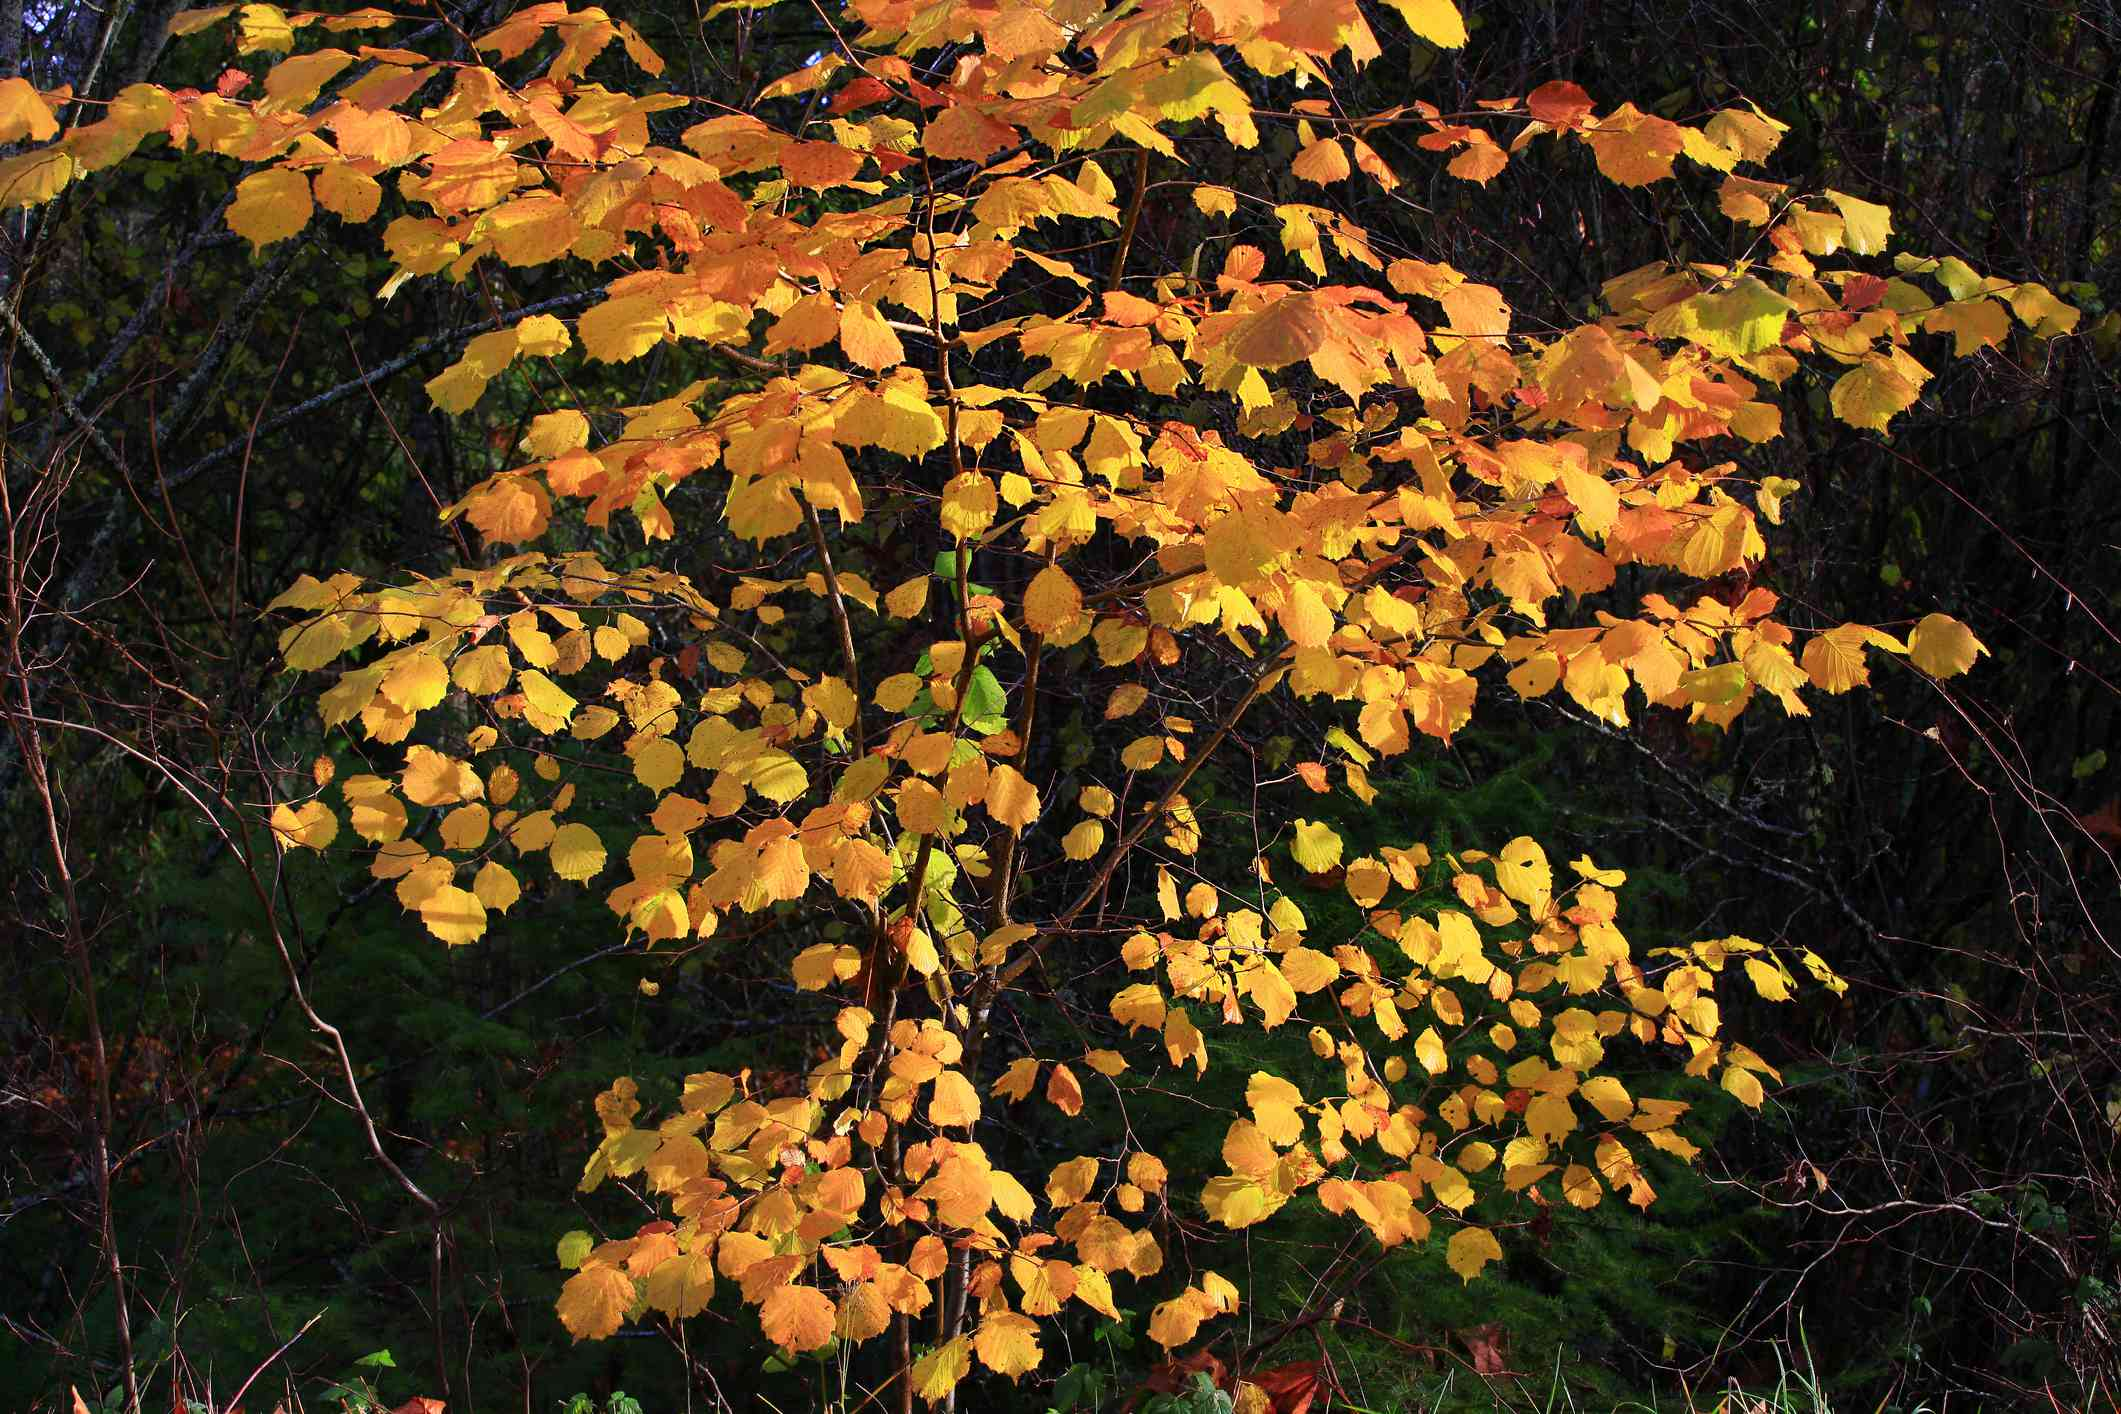 Beaked hazelnut (Corylus cornuta) shrub in the autumn with orange folaige.